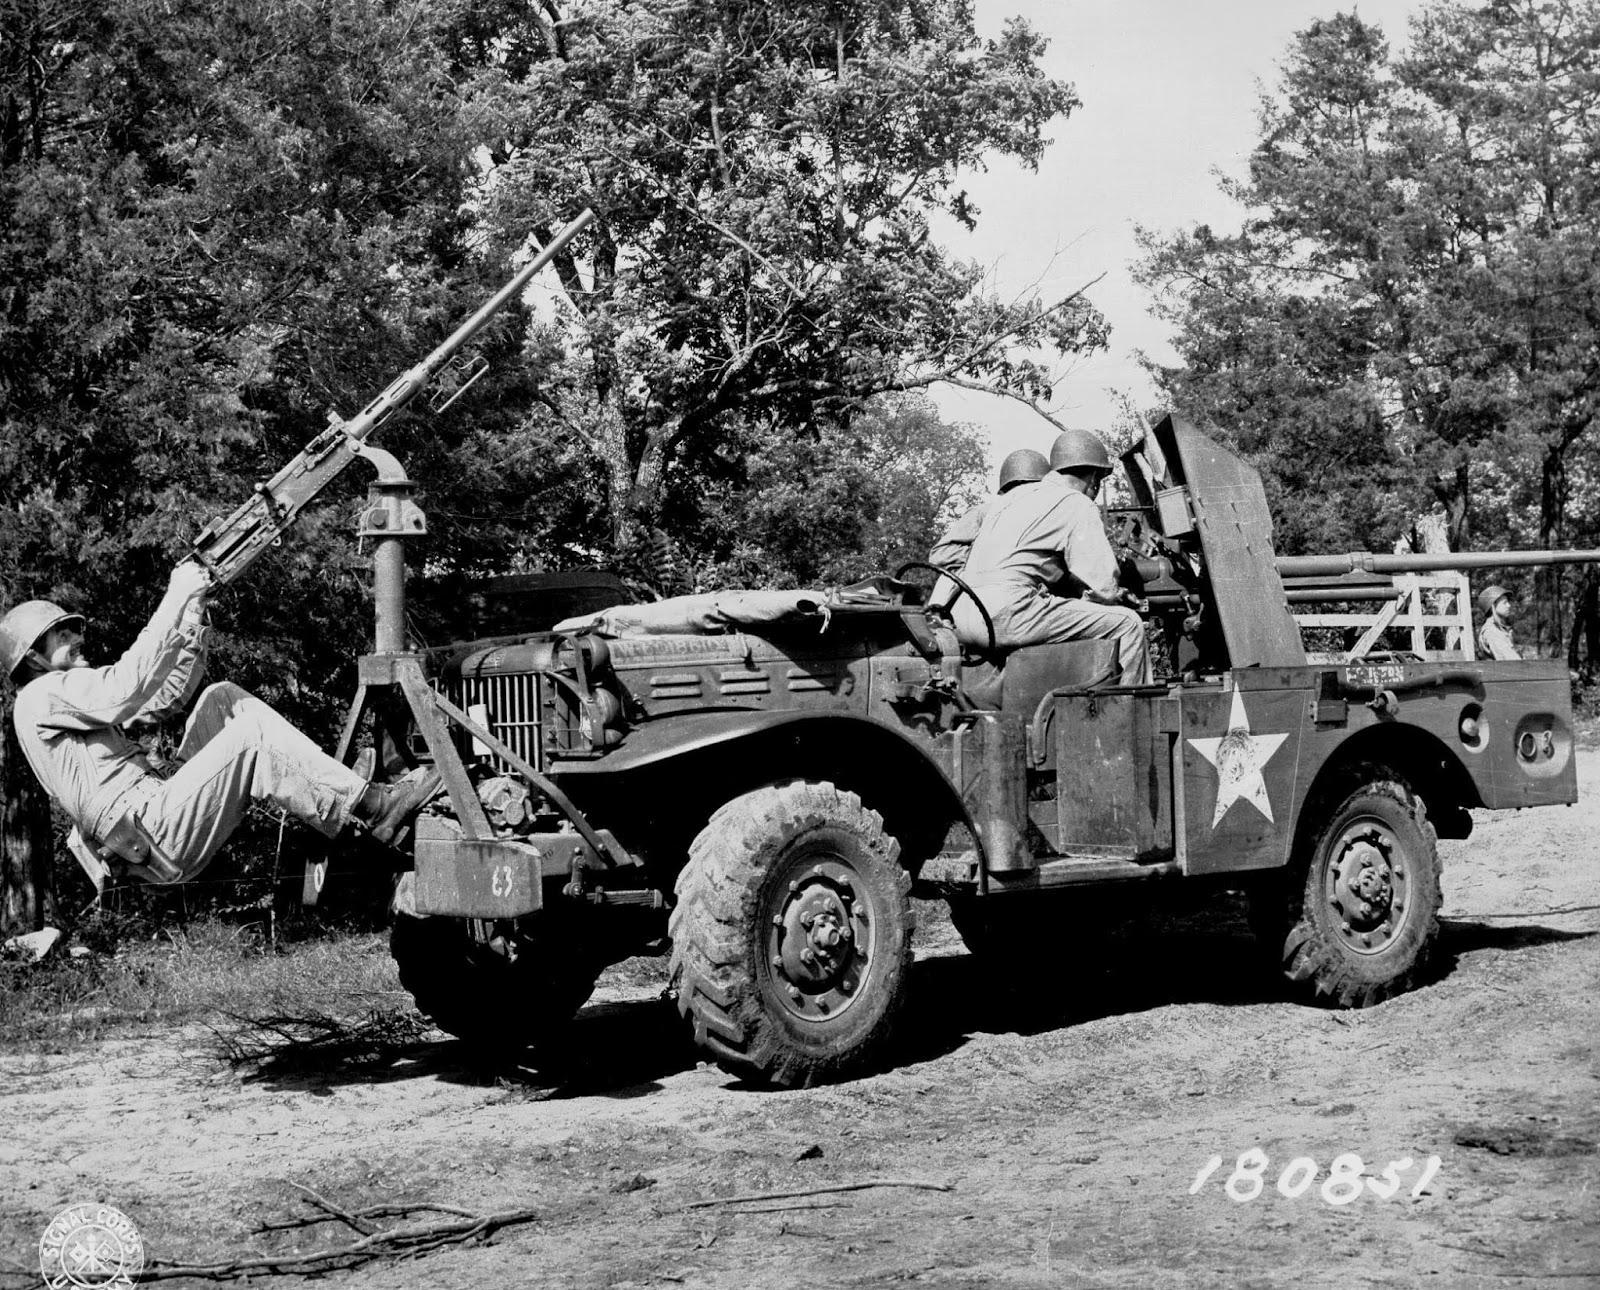 37mm-GMC M6